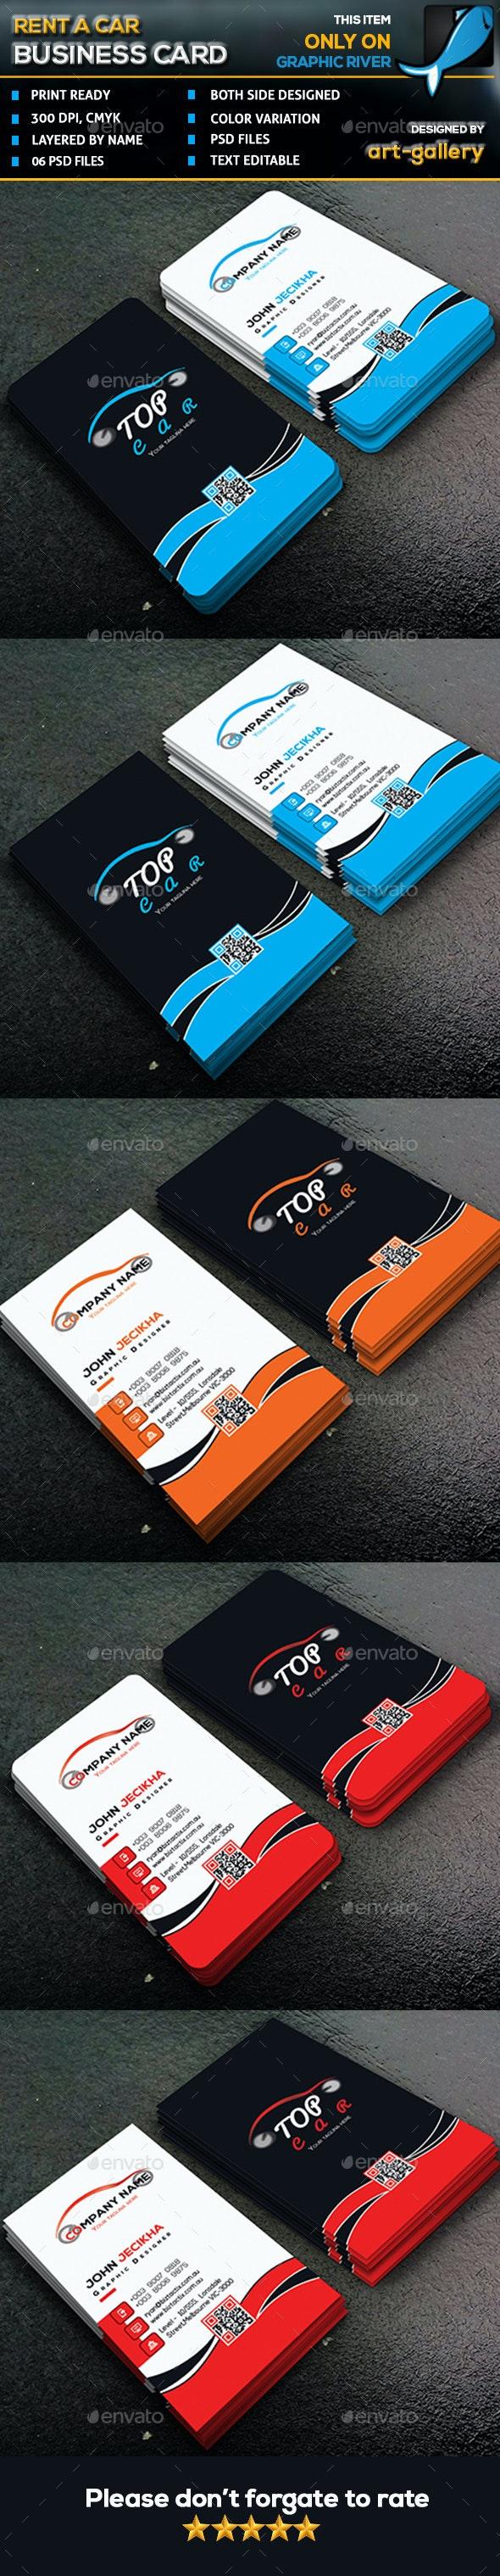 Rent a Car Business Card - 72B - Business Cards Print Templates